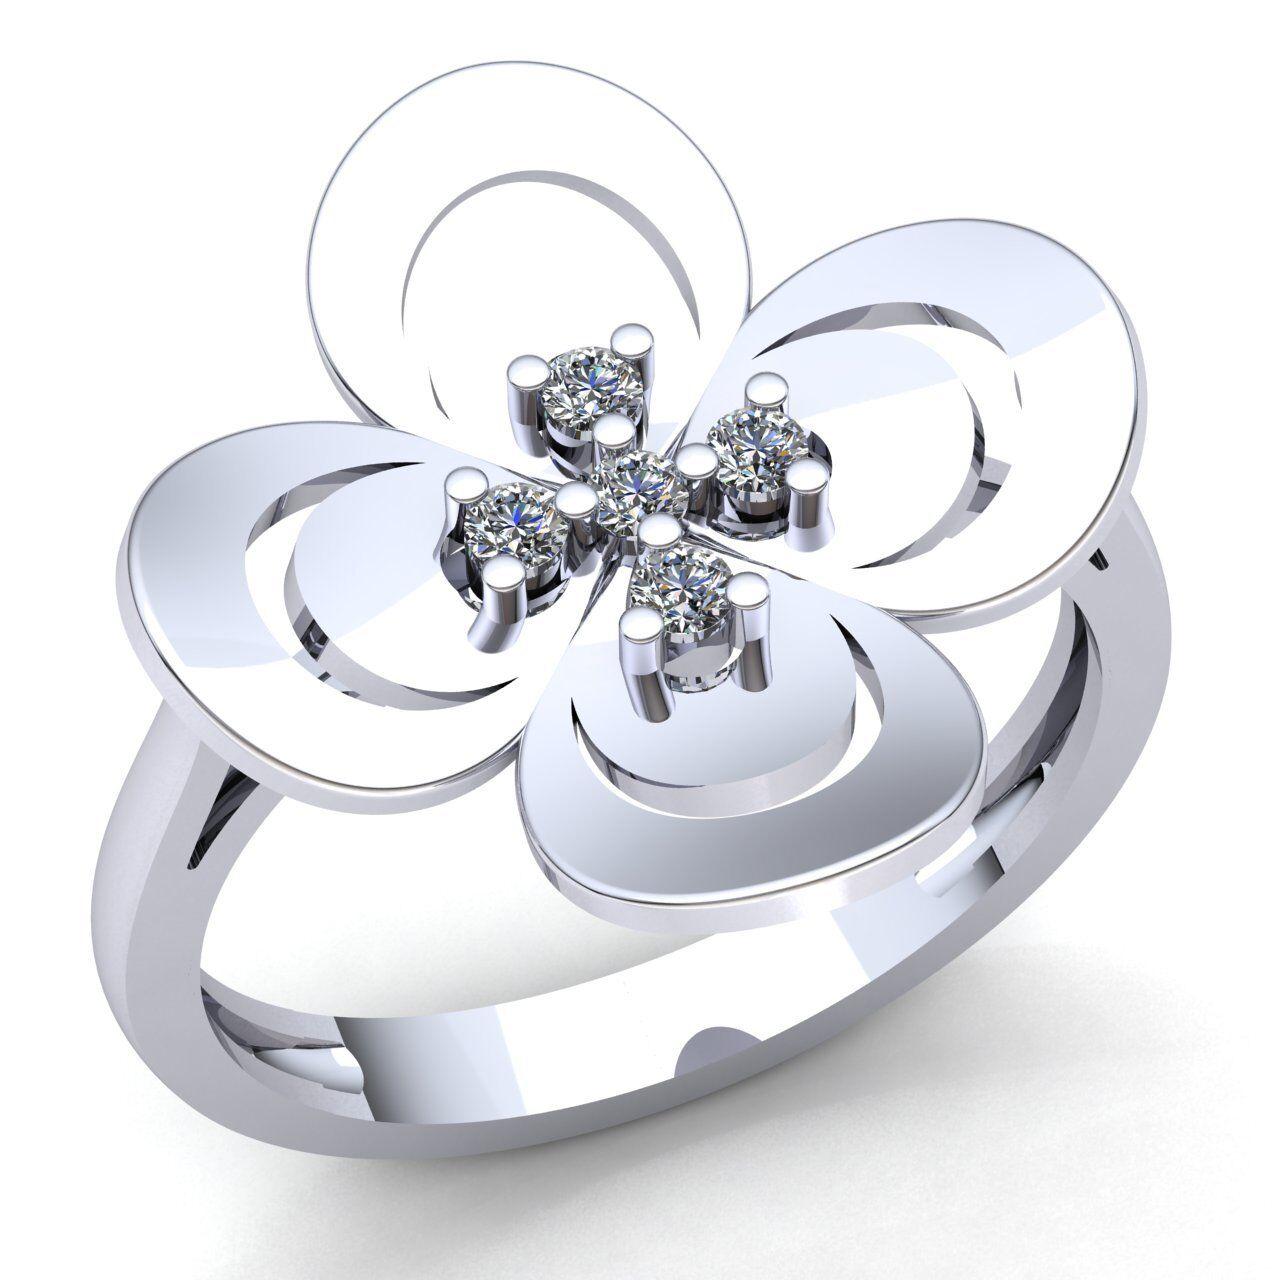 0.15carat Round Cut Diamond Ladies Flower Anniversary Engagement Ring 14K gold